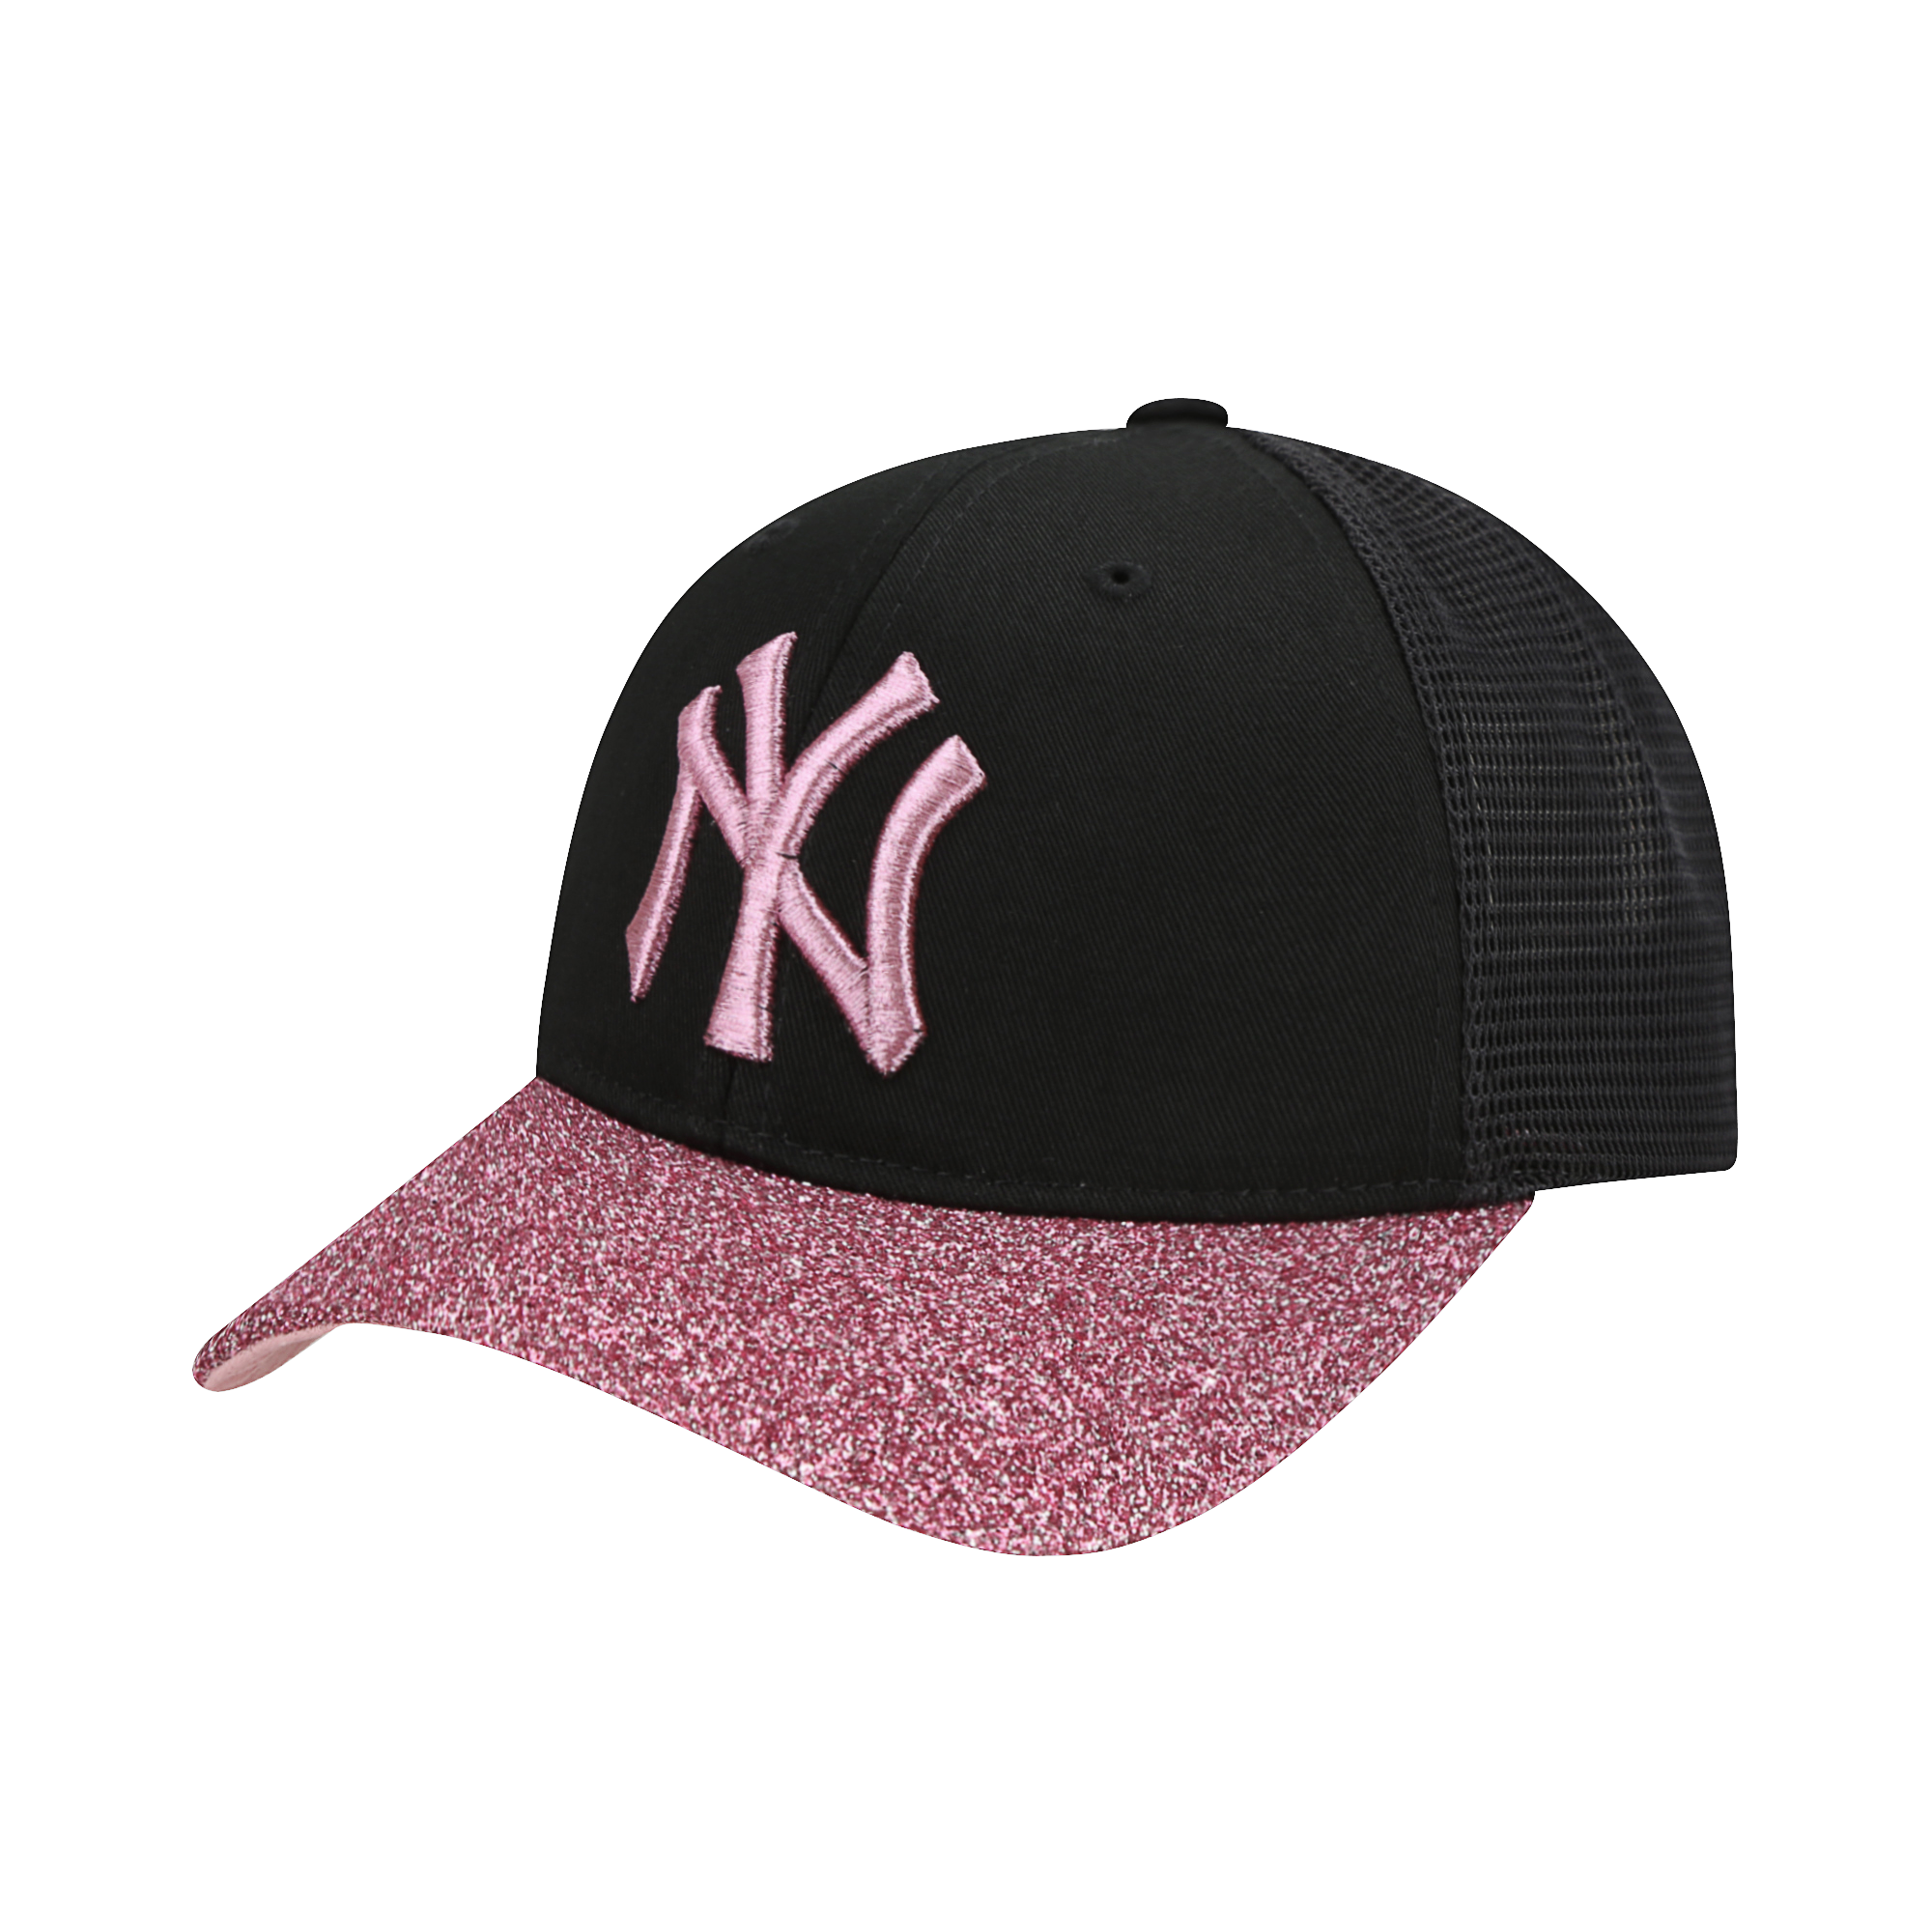 NEW YORK YANKEES SHINY GLITTER VISOR MESH CURVED CAP